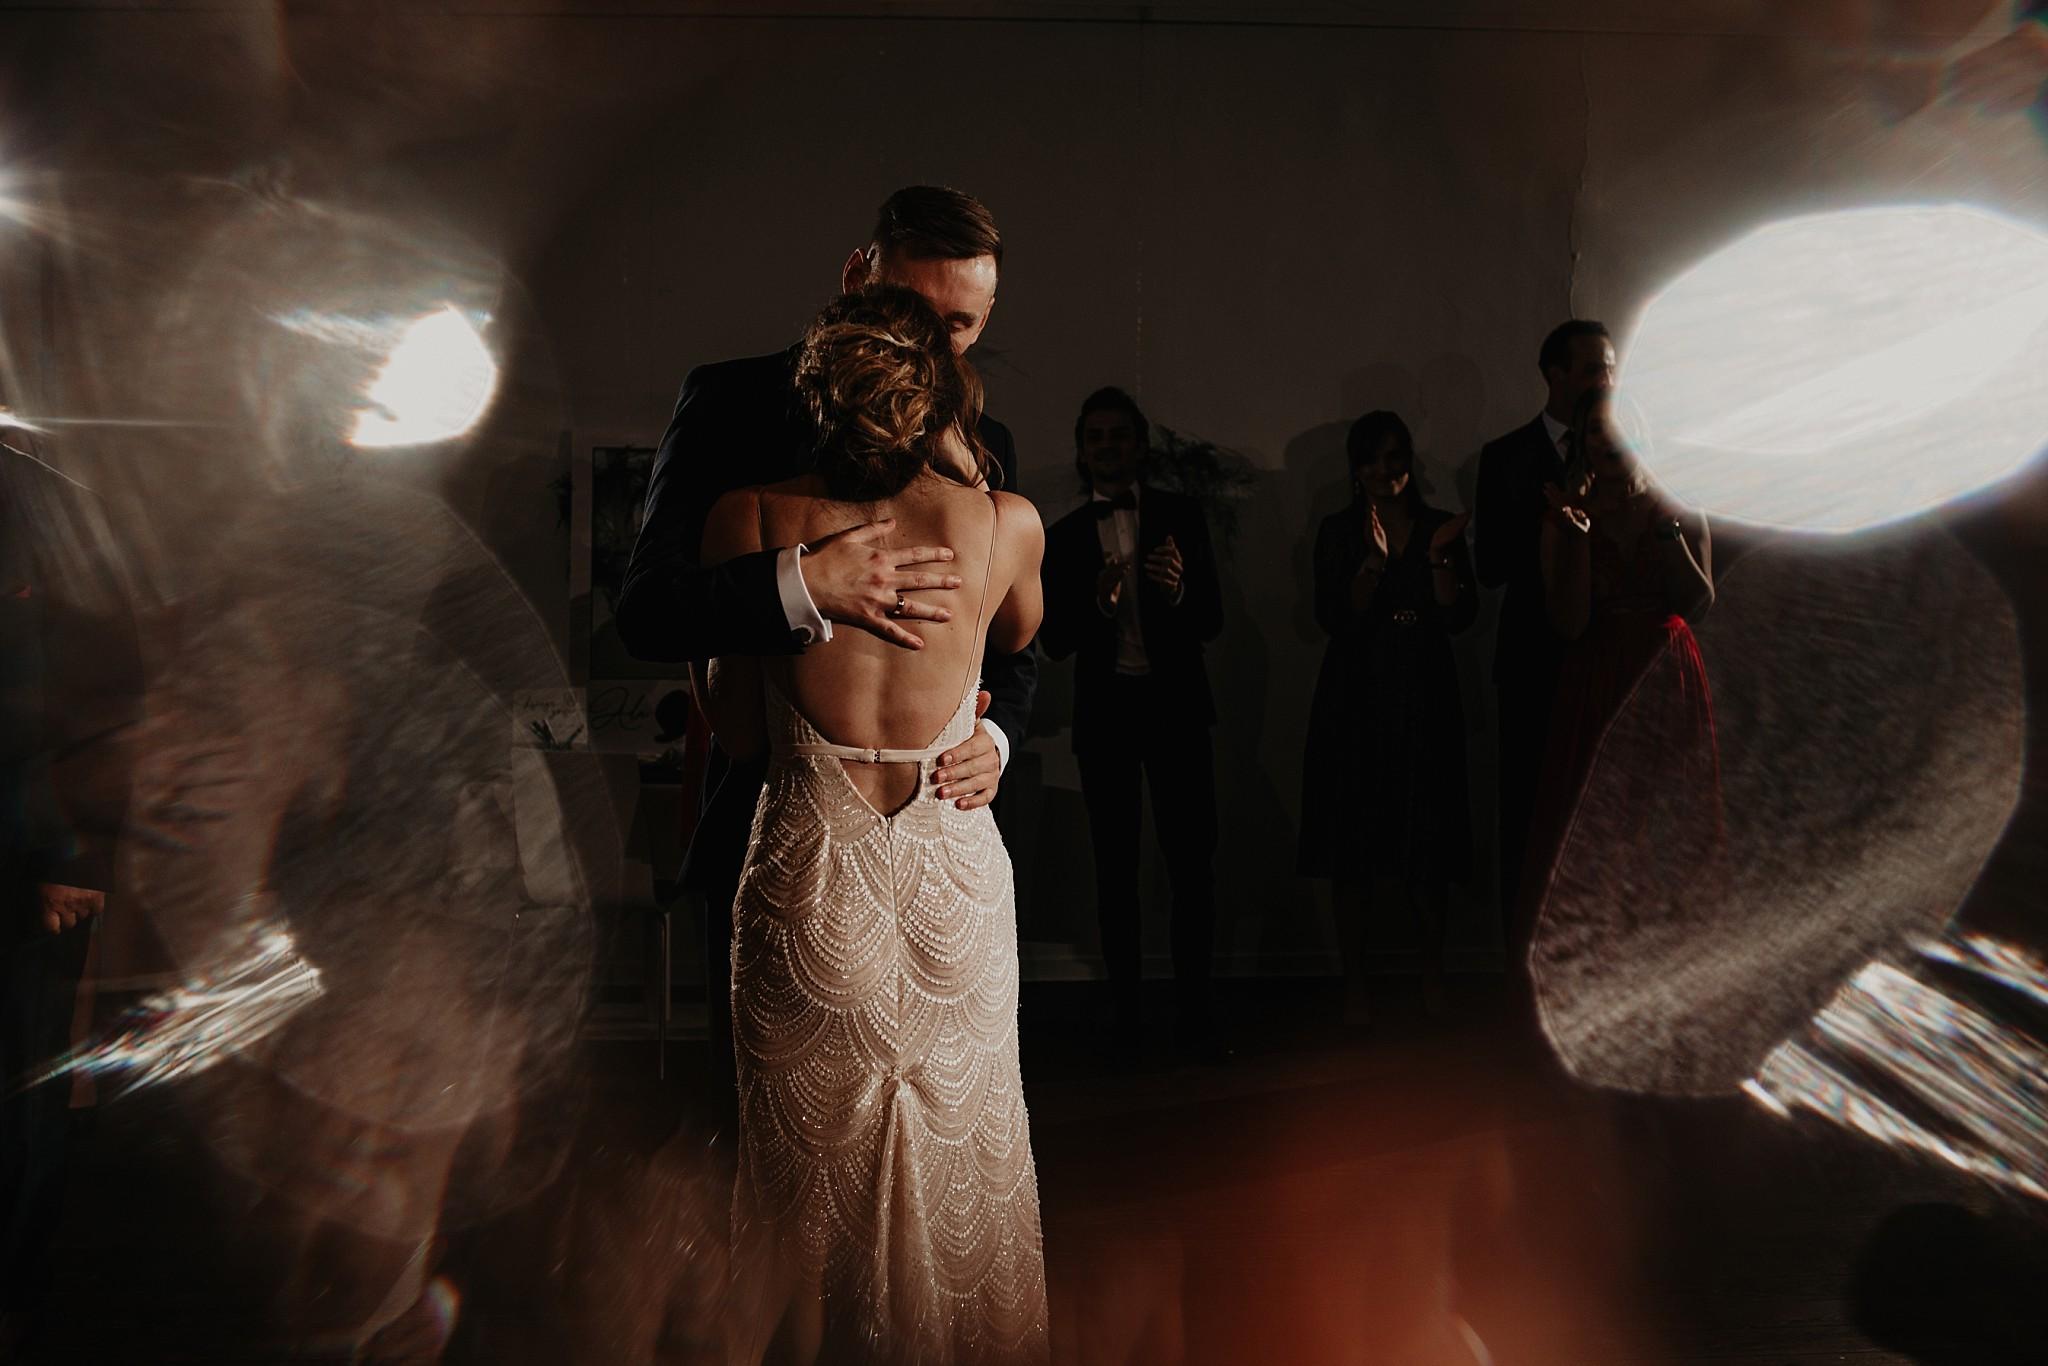 fotograf poznan wesele dobra truskawka piekne wesele pod poznaniem wesele w dobrej truskawce piekna para mloda slub marzen slub koronawirus slub listopad wesele koronawirus 396